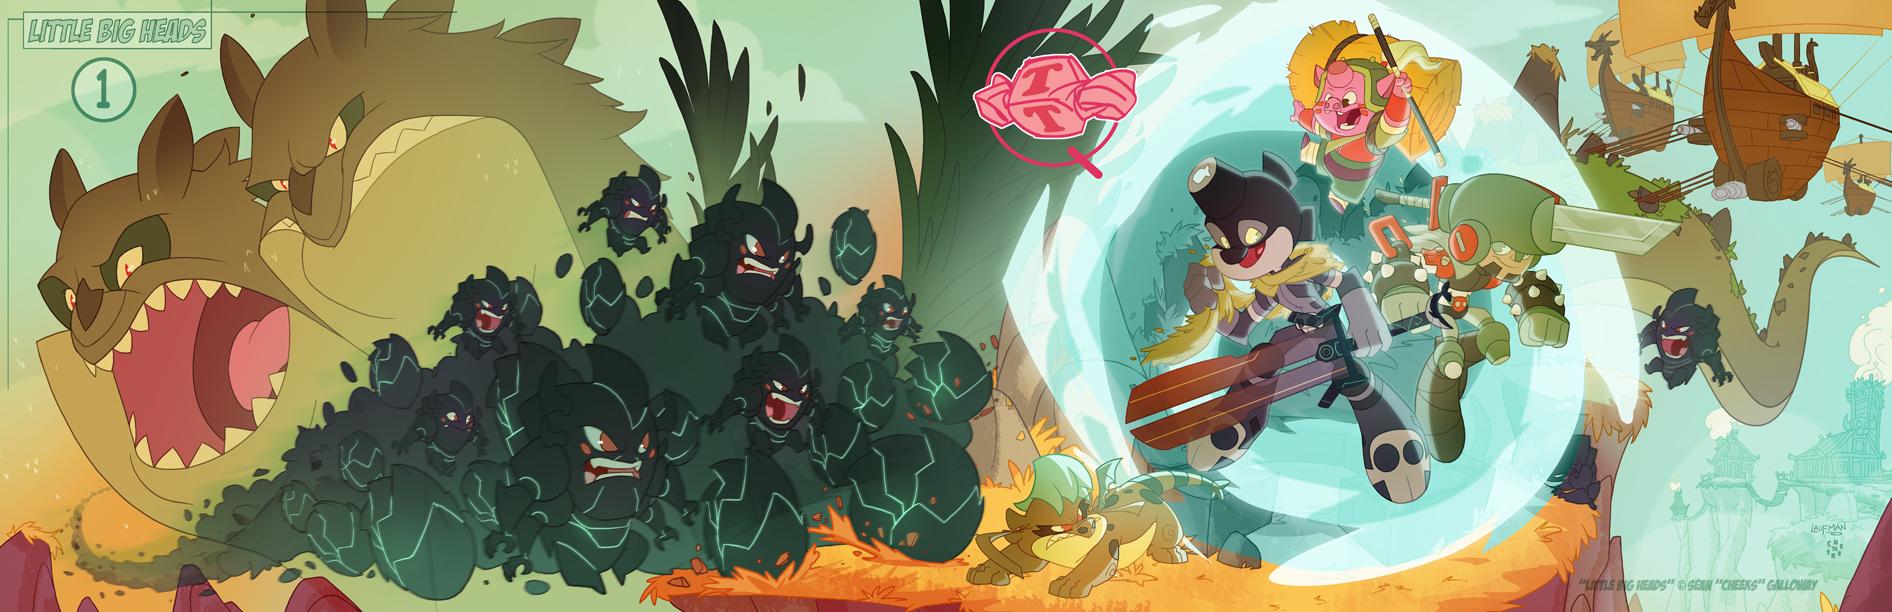 LittleBigHeads Kickstarter promo finished! by DerekLaufman